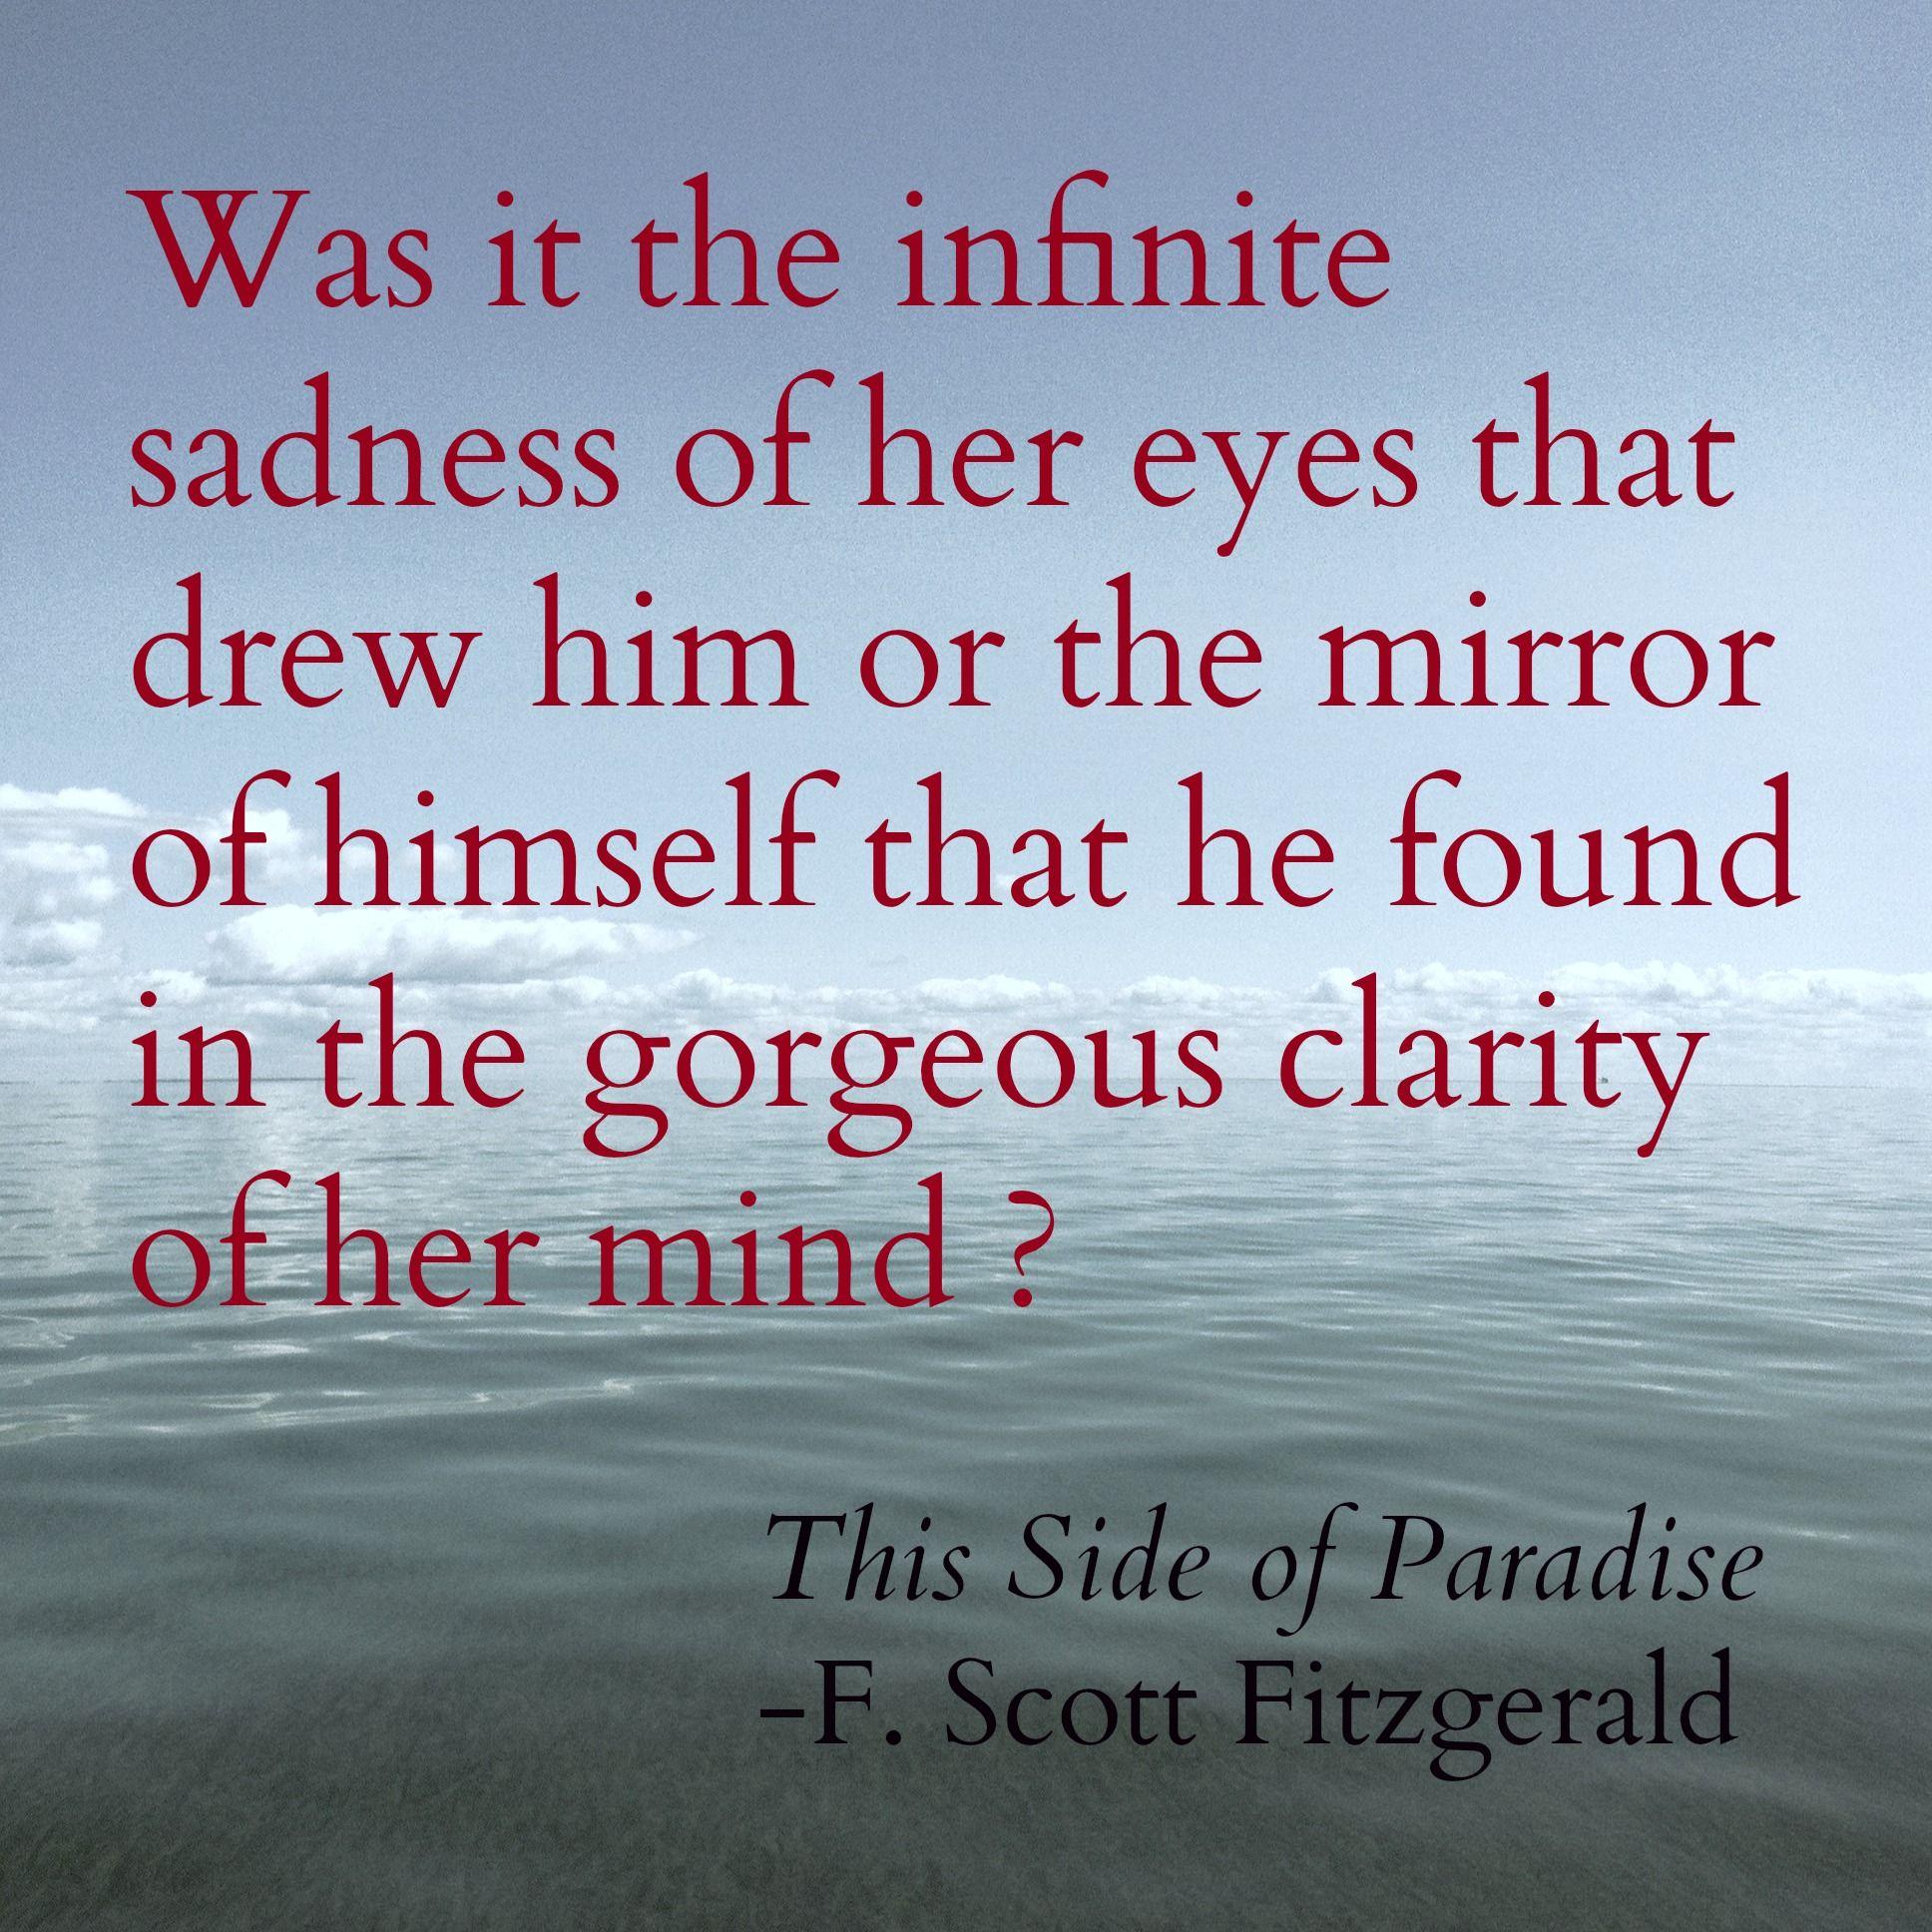 Paradise Quotes This Side Of Paradise Fscott Fitzgerald  Fscott Fitzgerald